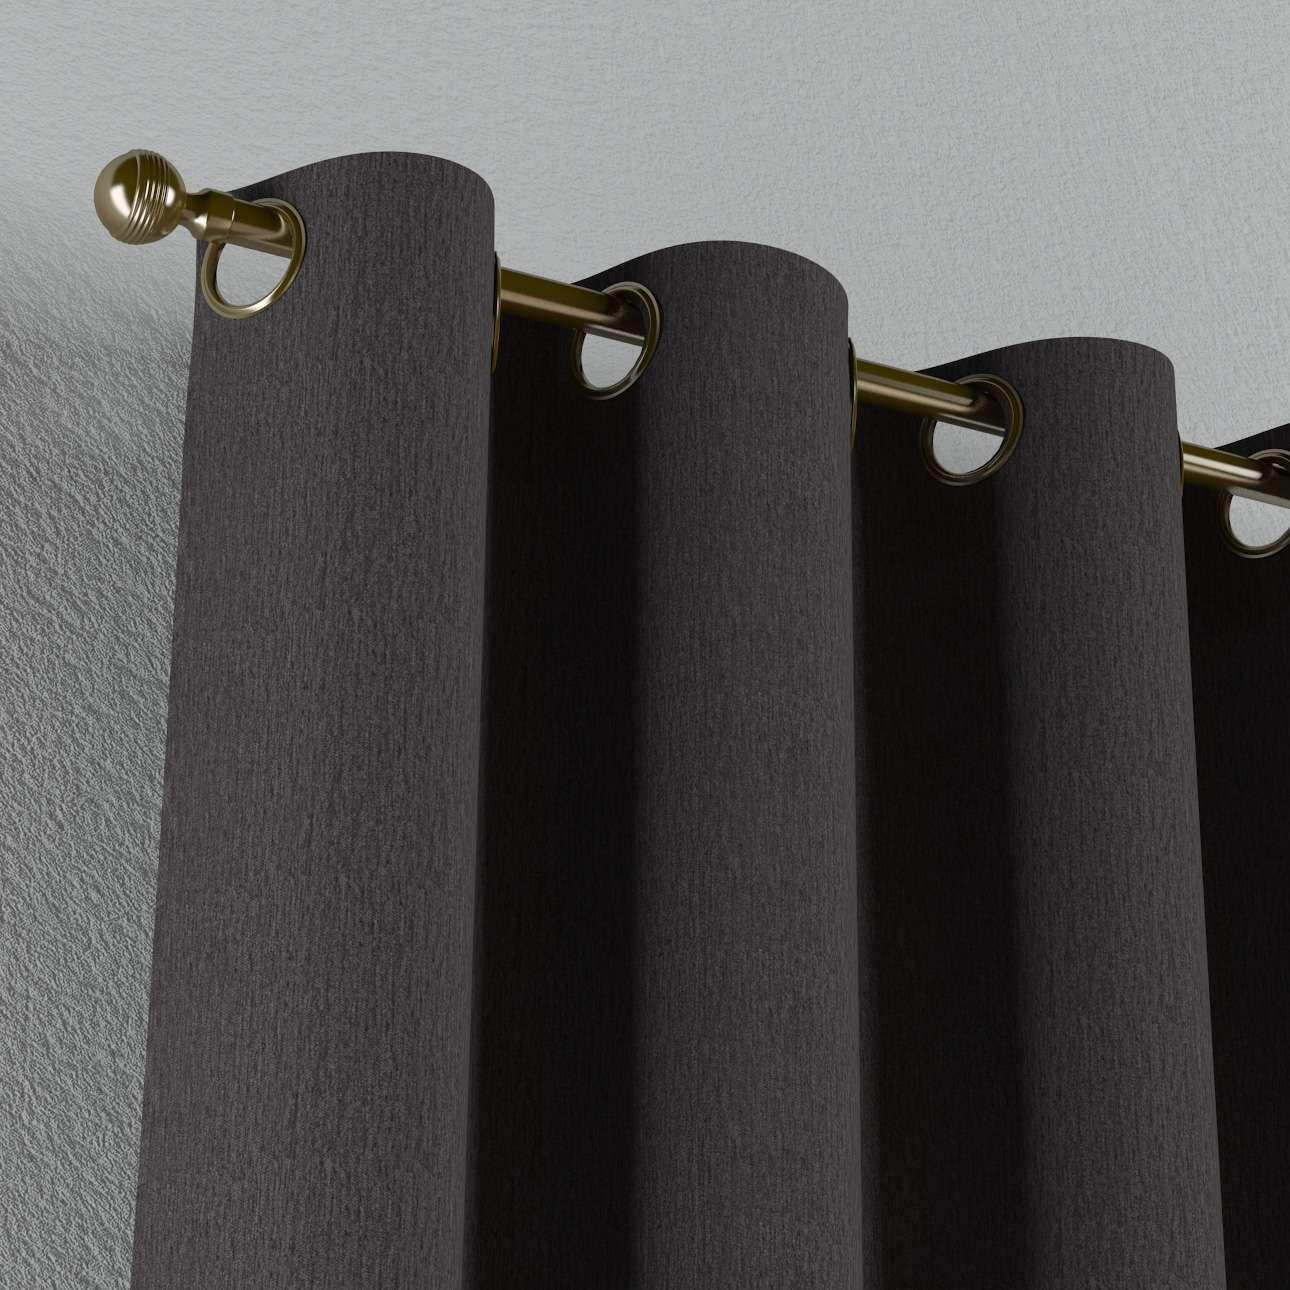 Zasłona na kółkach 1 szt. 1szt 130x260 cm w kolekcji Chenille, tkanina: 702-20